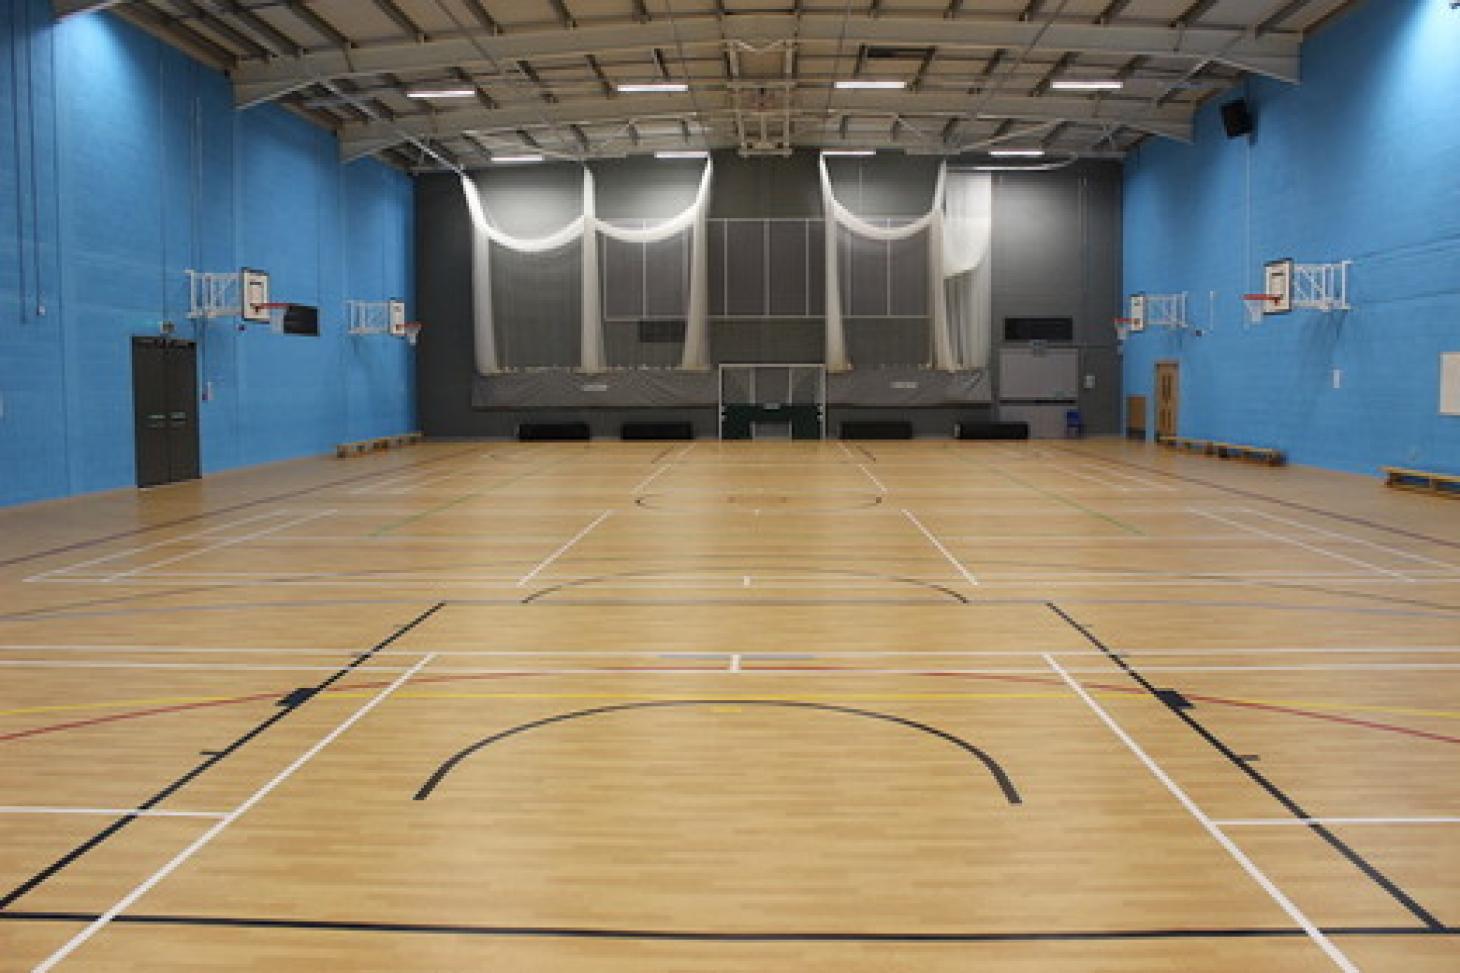 Amersham School Indoor basketball court